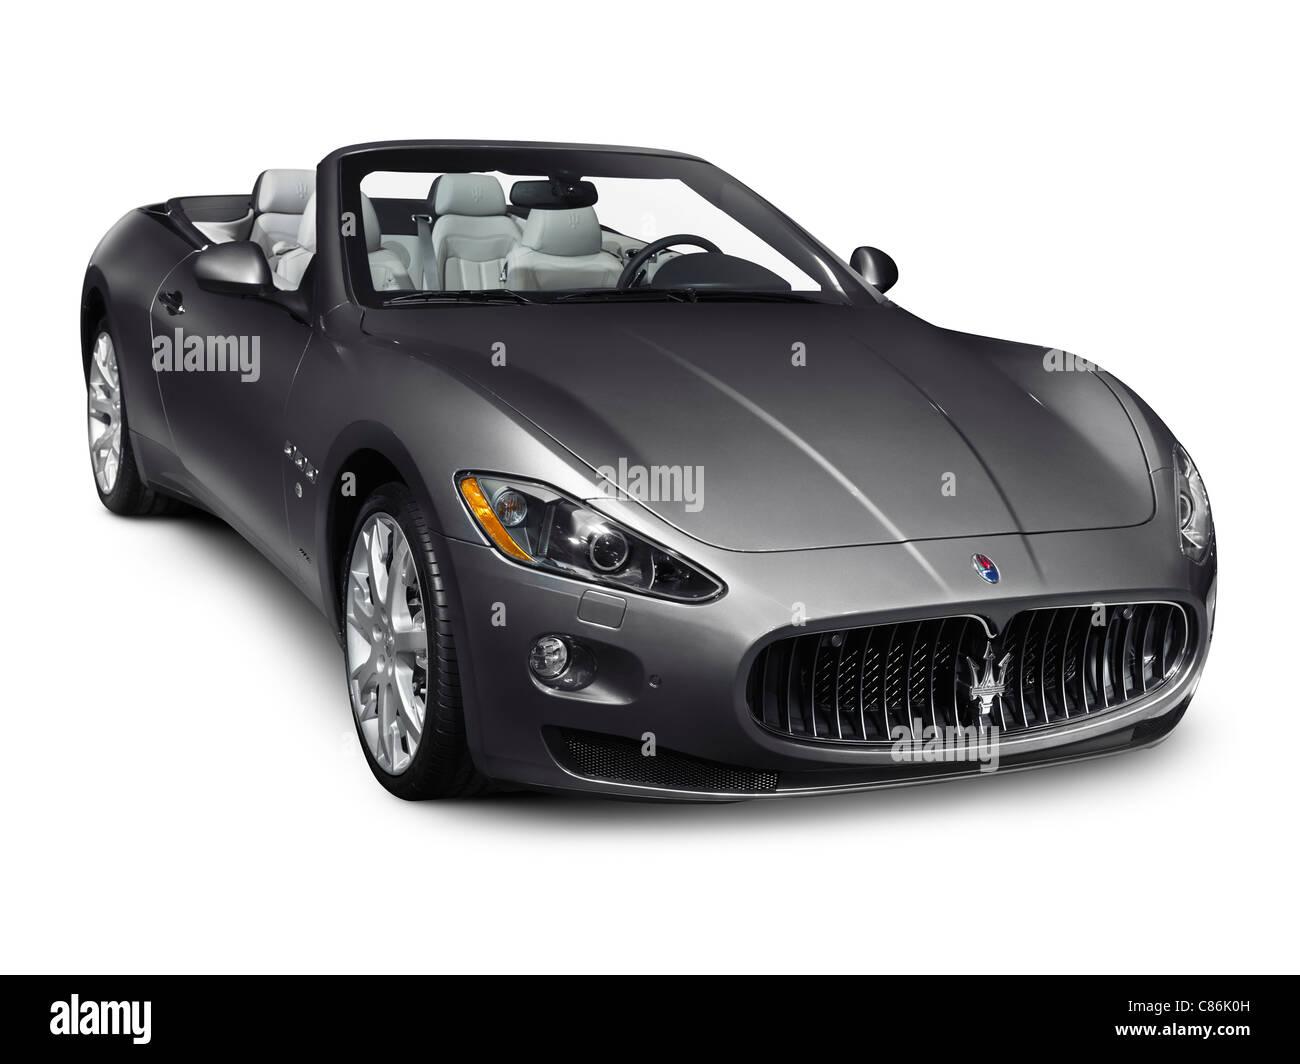 2011 Maserati GranTurismo Convertible GranCabrio Luxury Car Isolated On  White Background   Stock Image